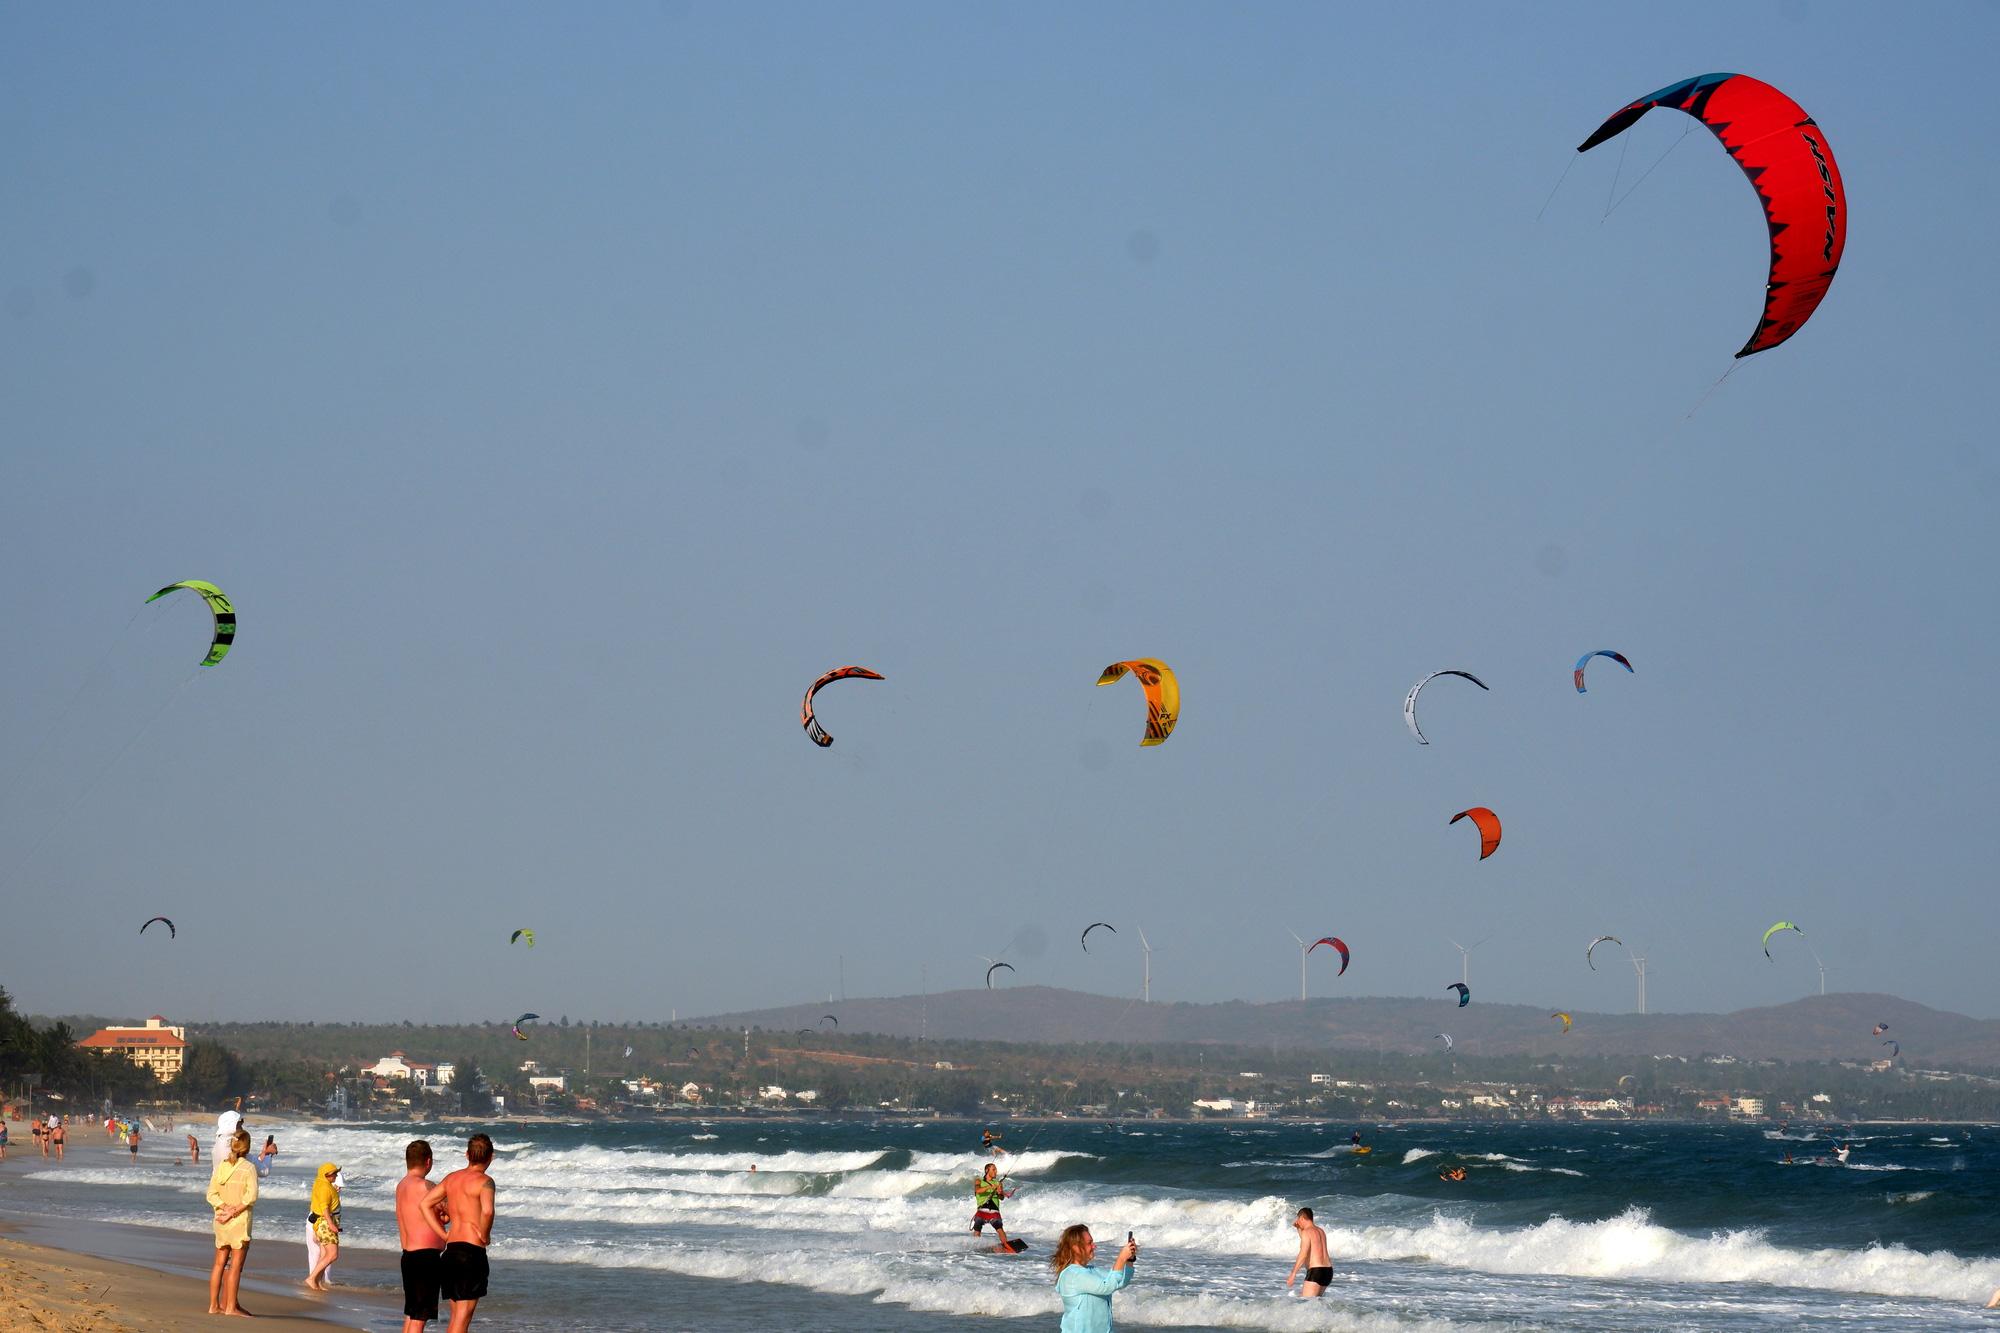 Kite surfers crowd beach in Binh Thuan, Vietnam's COVID-19 epicenter